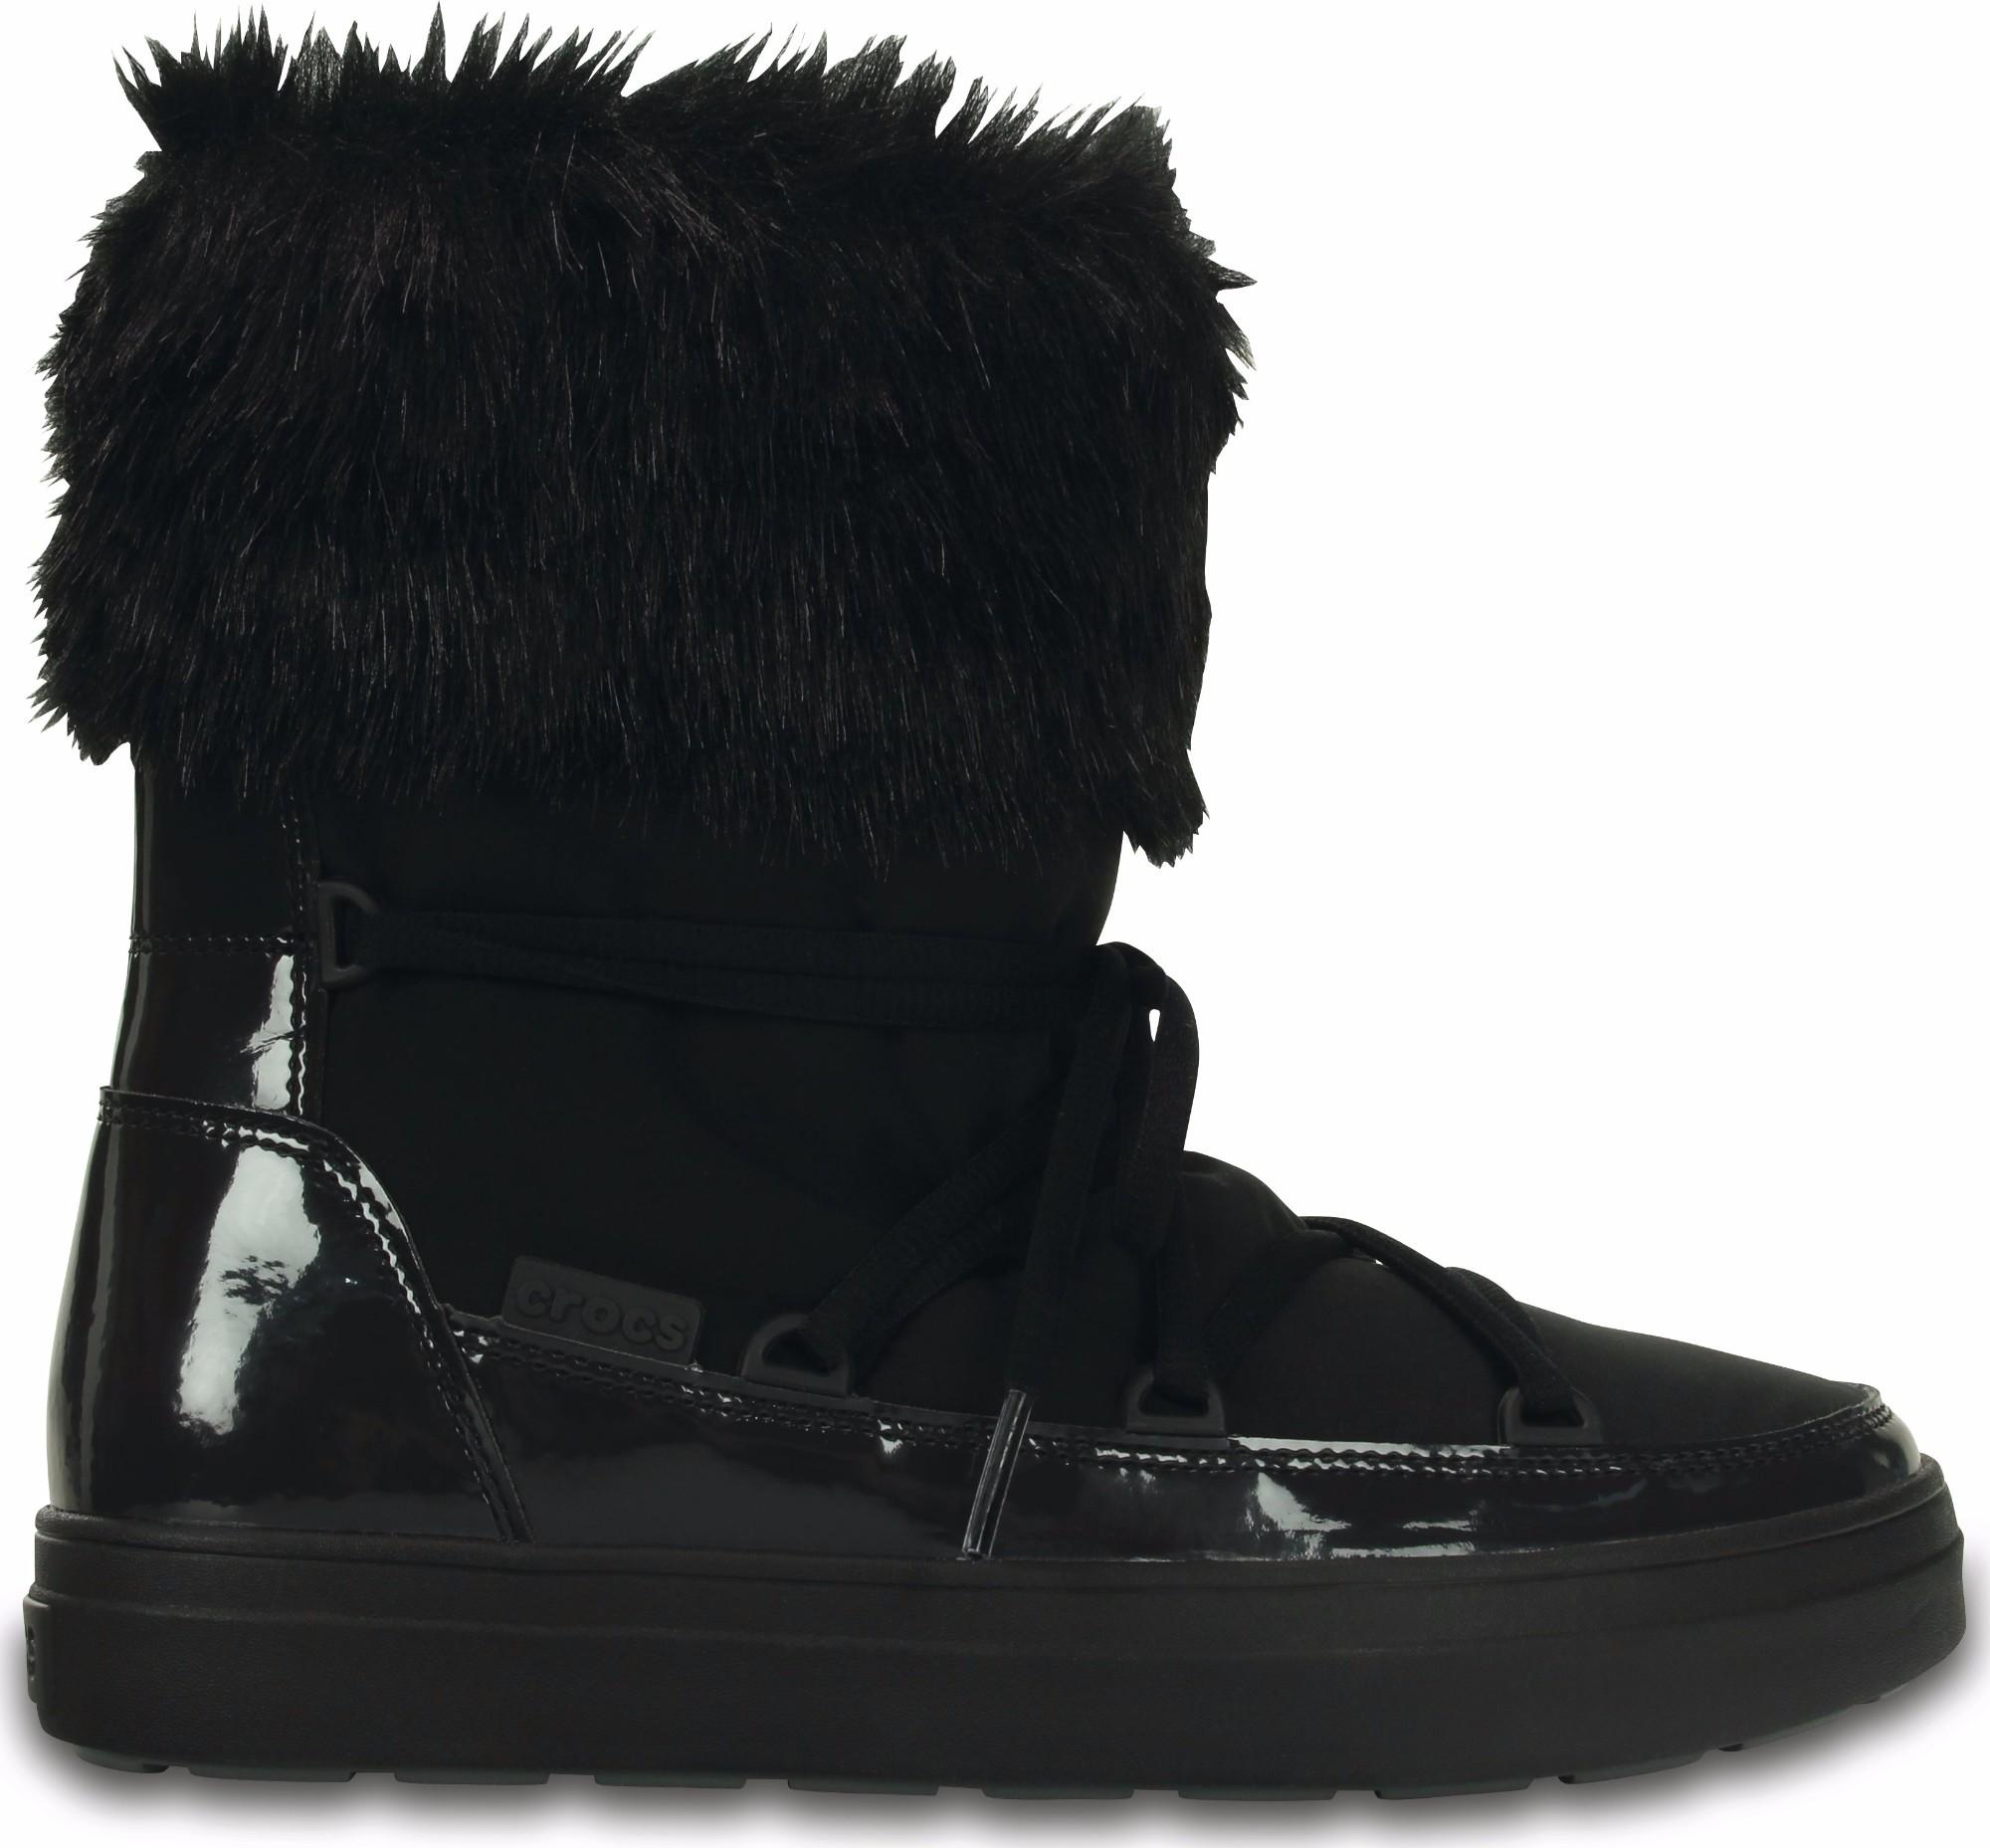 Crocs™ Lodgepoint Lace Boot Black 35